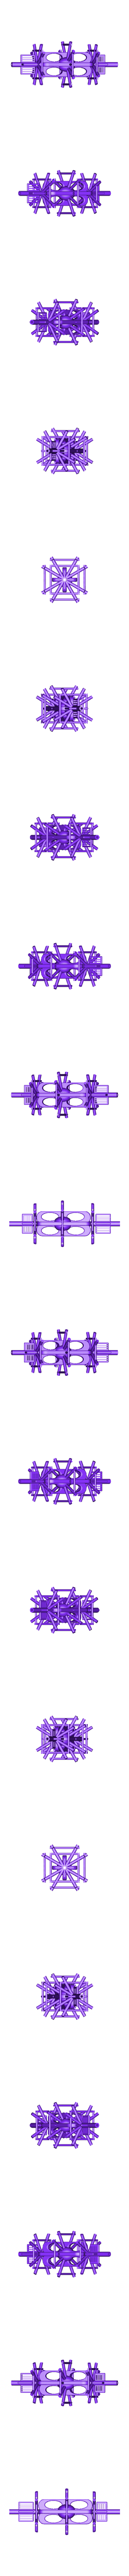 warhead_6_clear_core_whole.stl Download free STL file GI Joe Nanomites warhead • 3D print model, poblocki1982